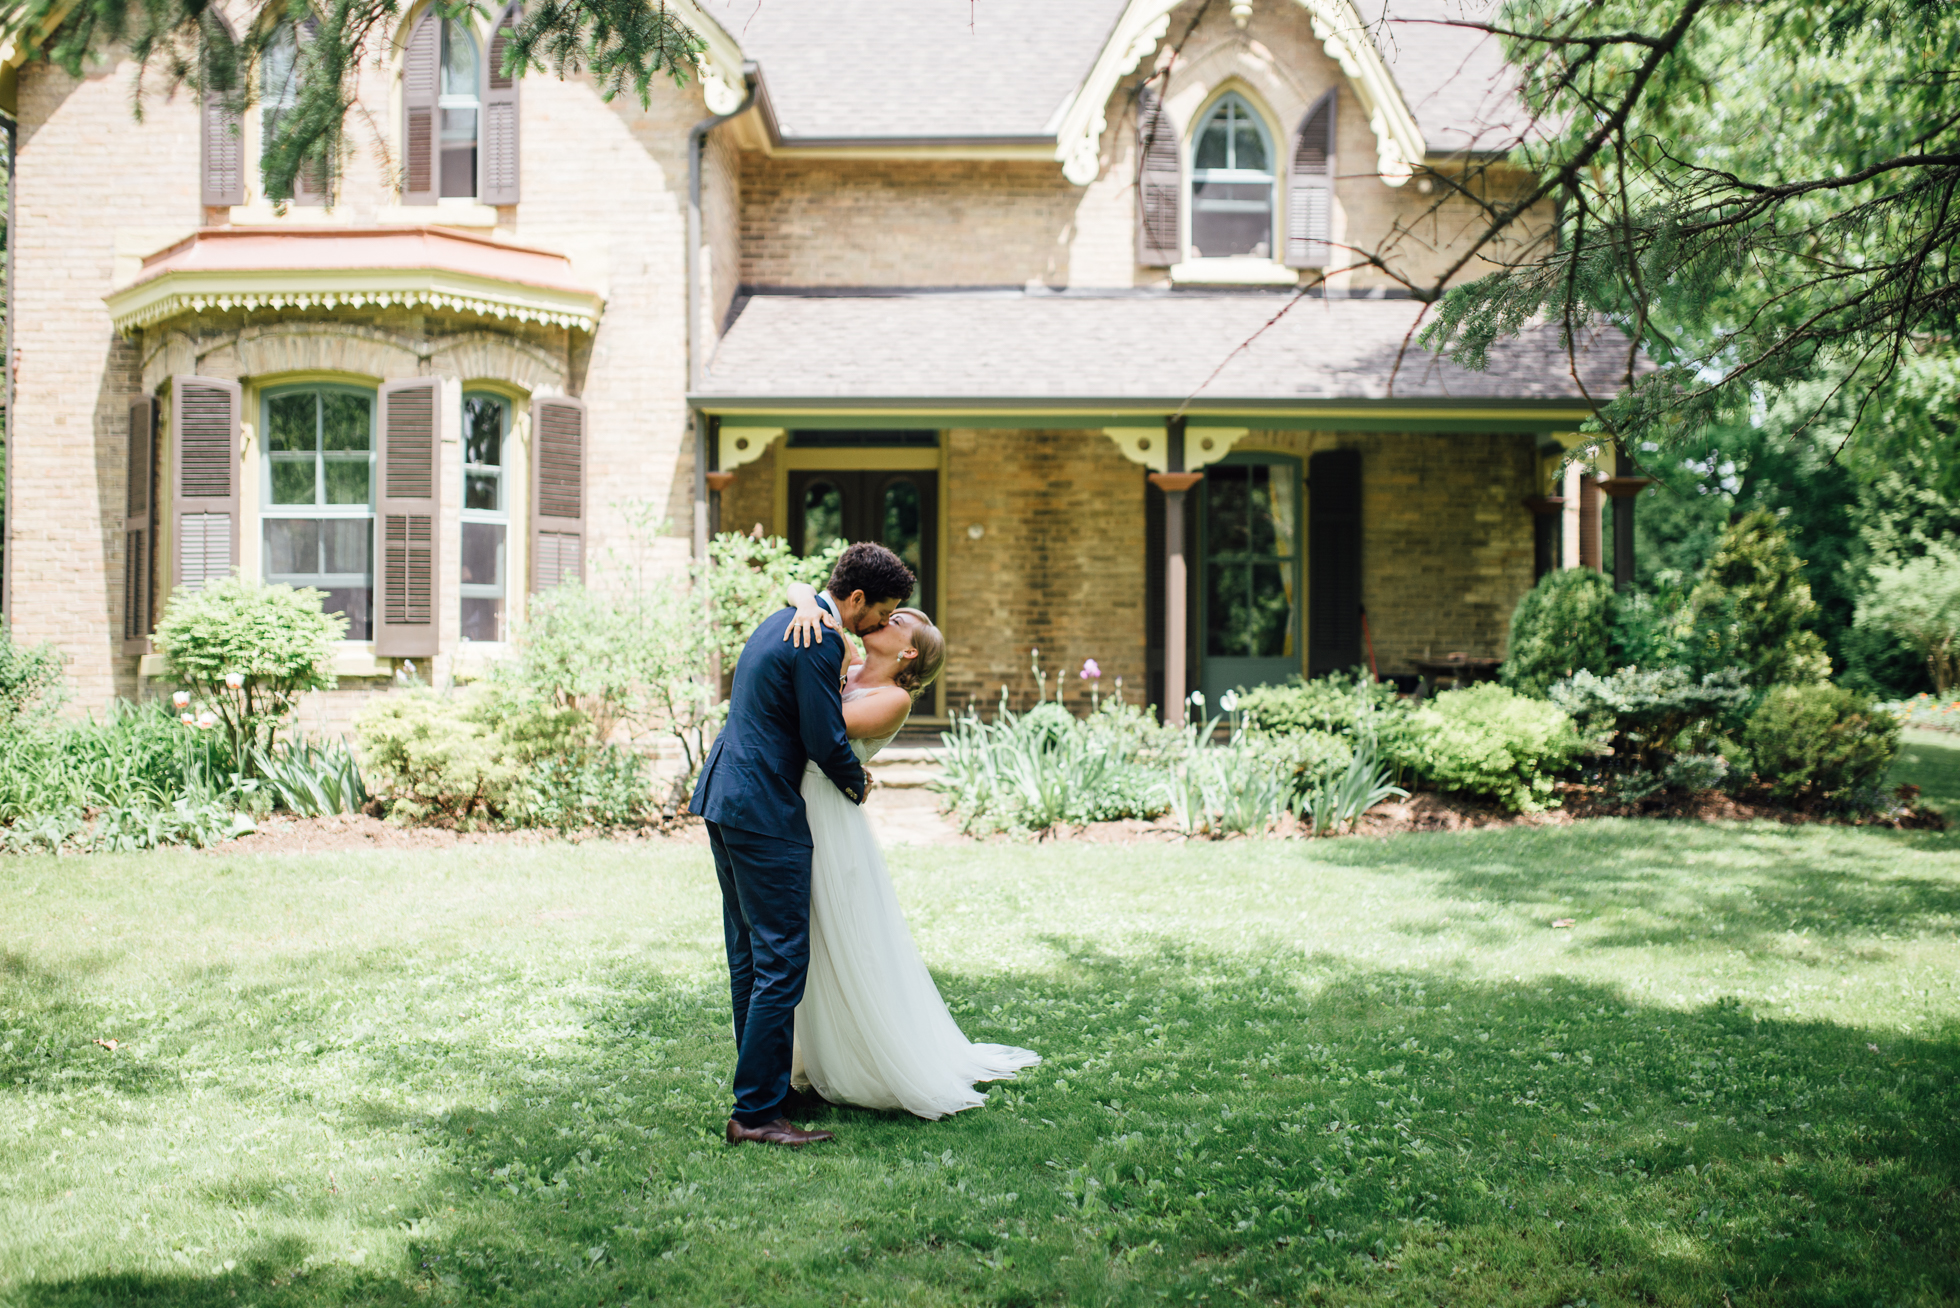 Outdoor-Caledon-Tralee-Wedding-Photography-30